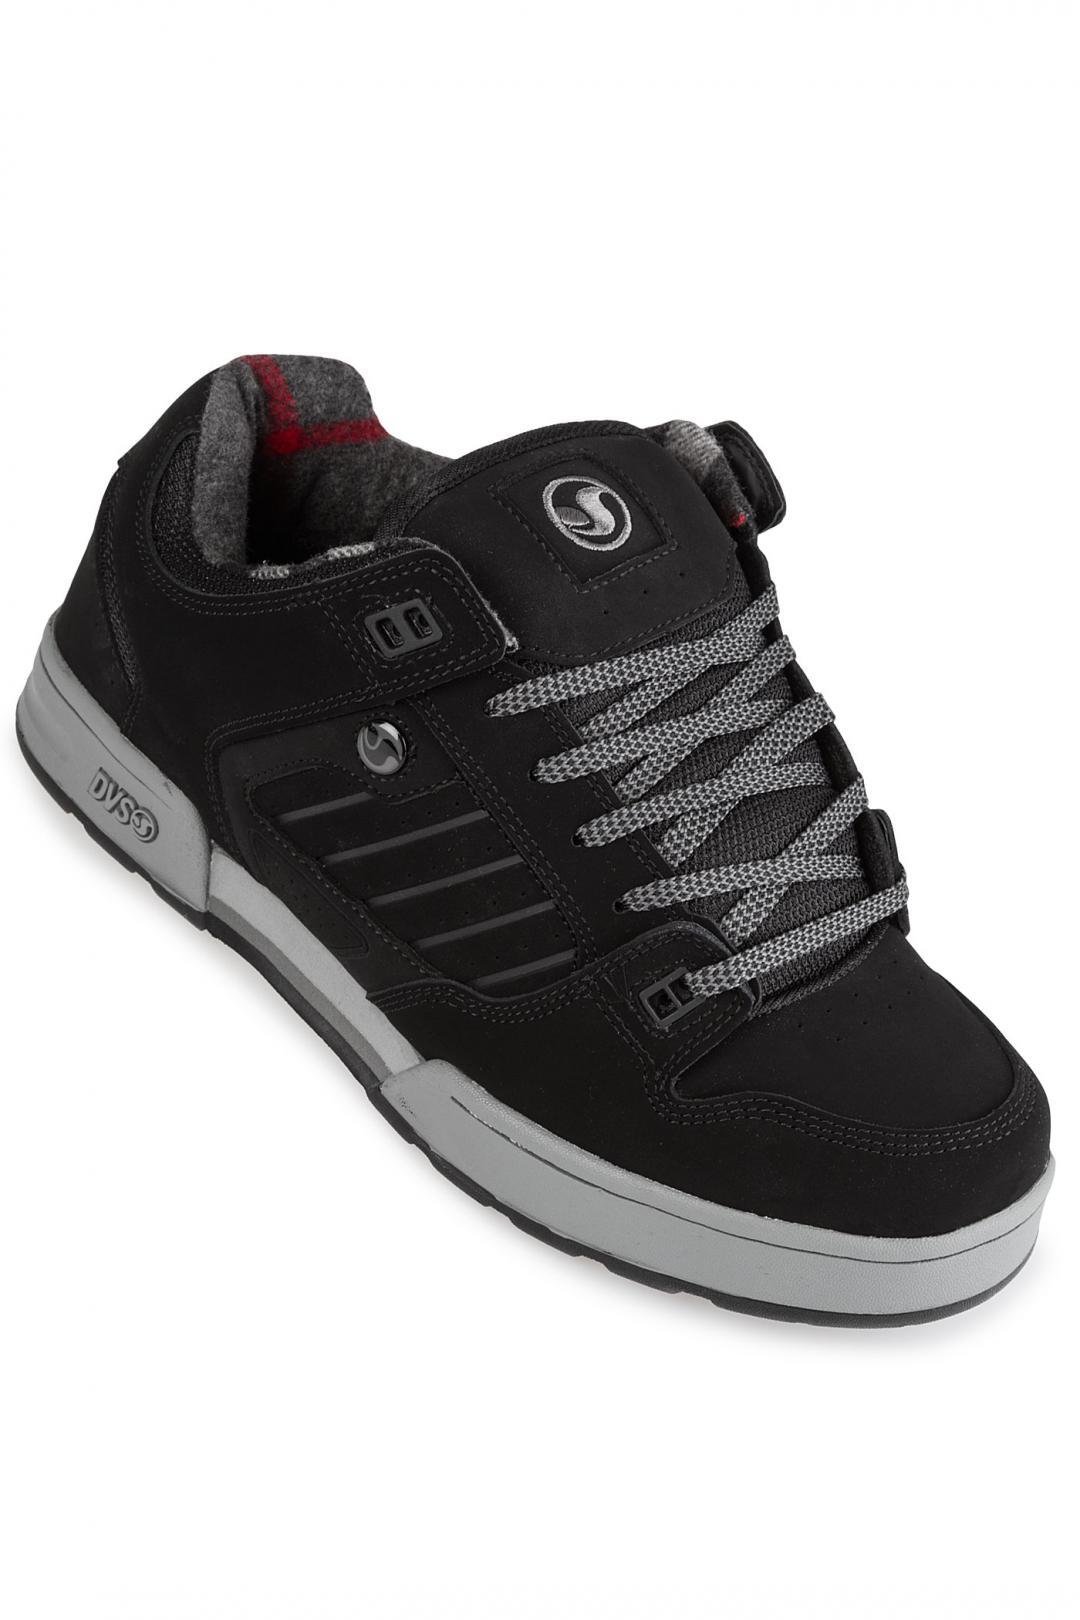 Uomo DVS Militia Snow Nubuck black gargoyle | Sneaker